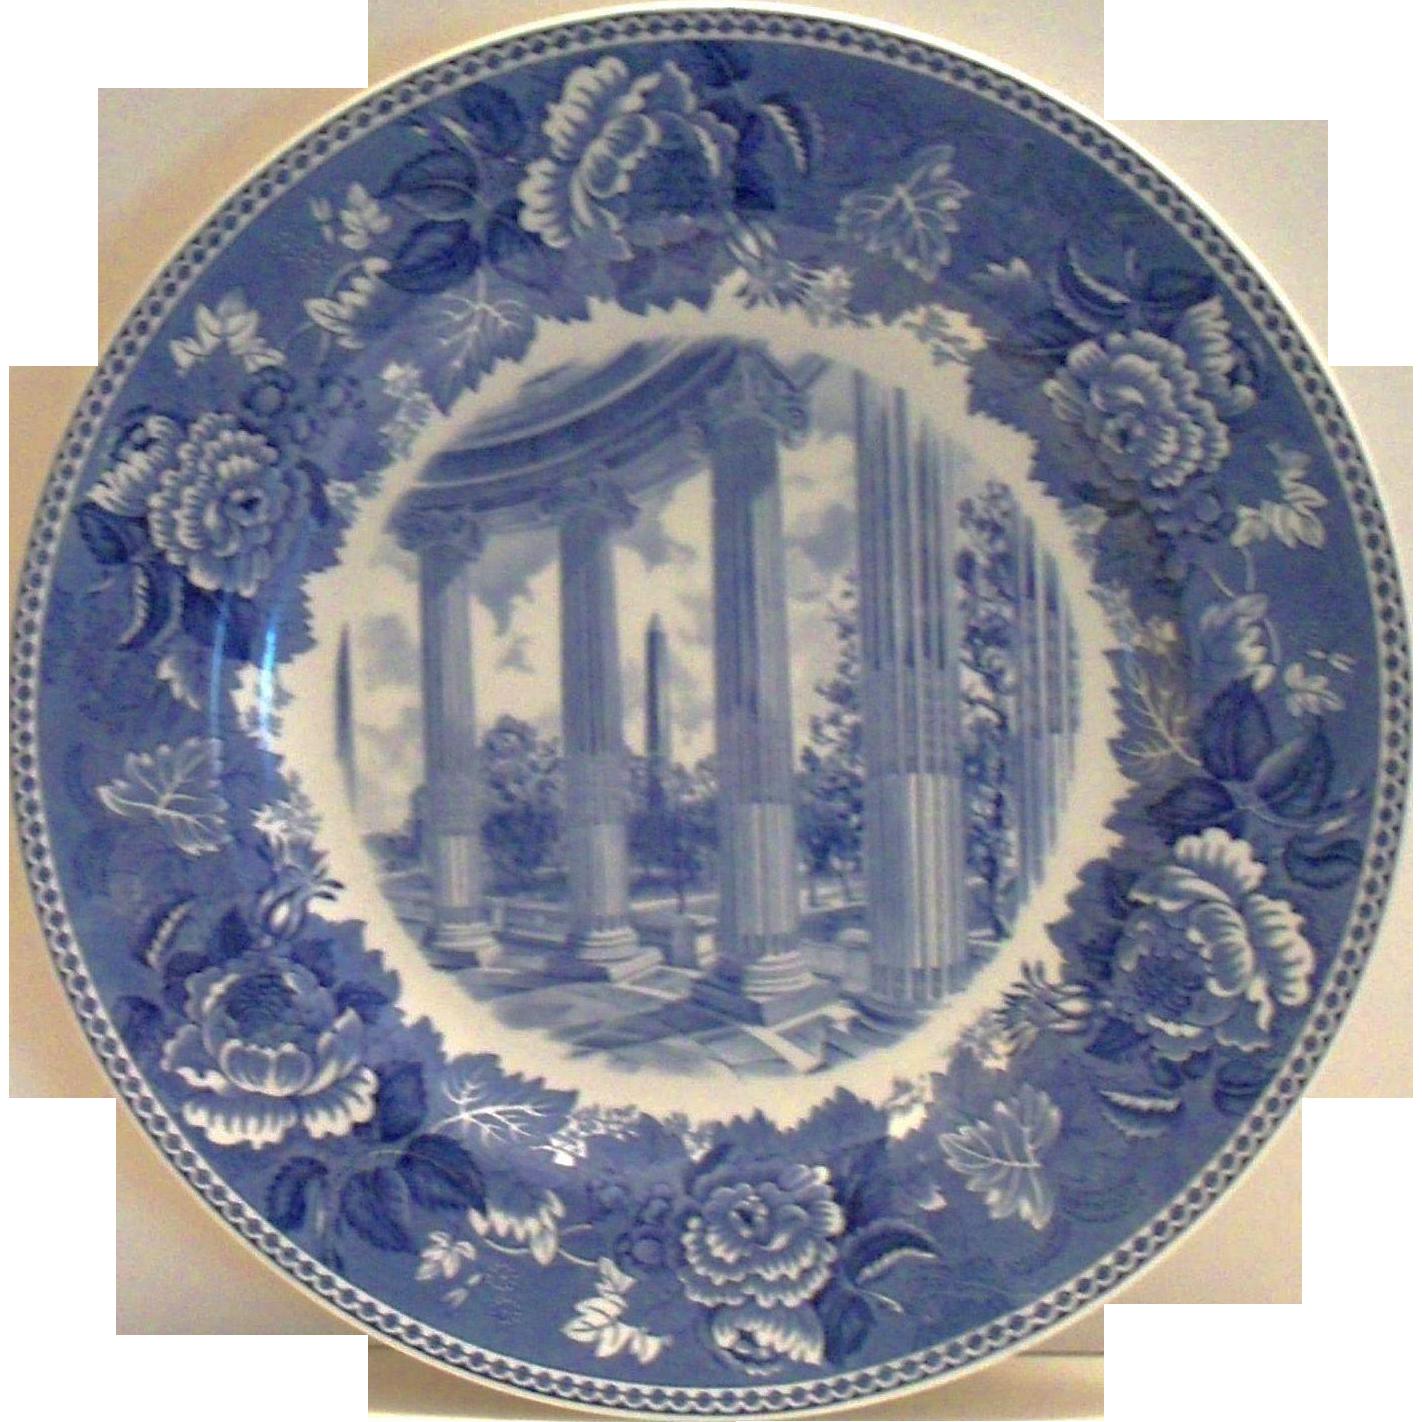 "Wedgwood: Washington Bicentennial Plate "" Washington Monument"" Porcelain Plate"